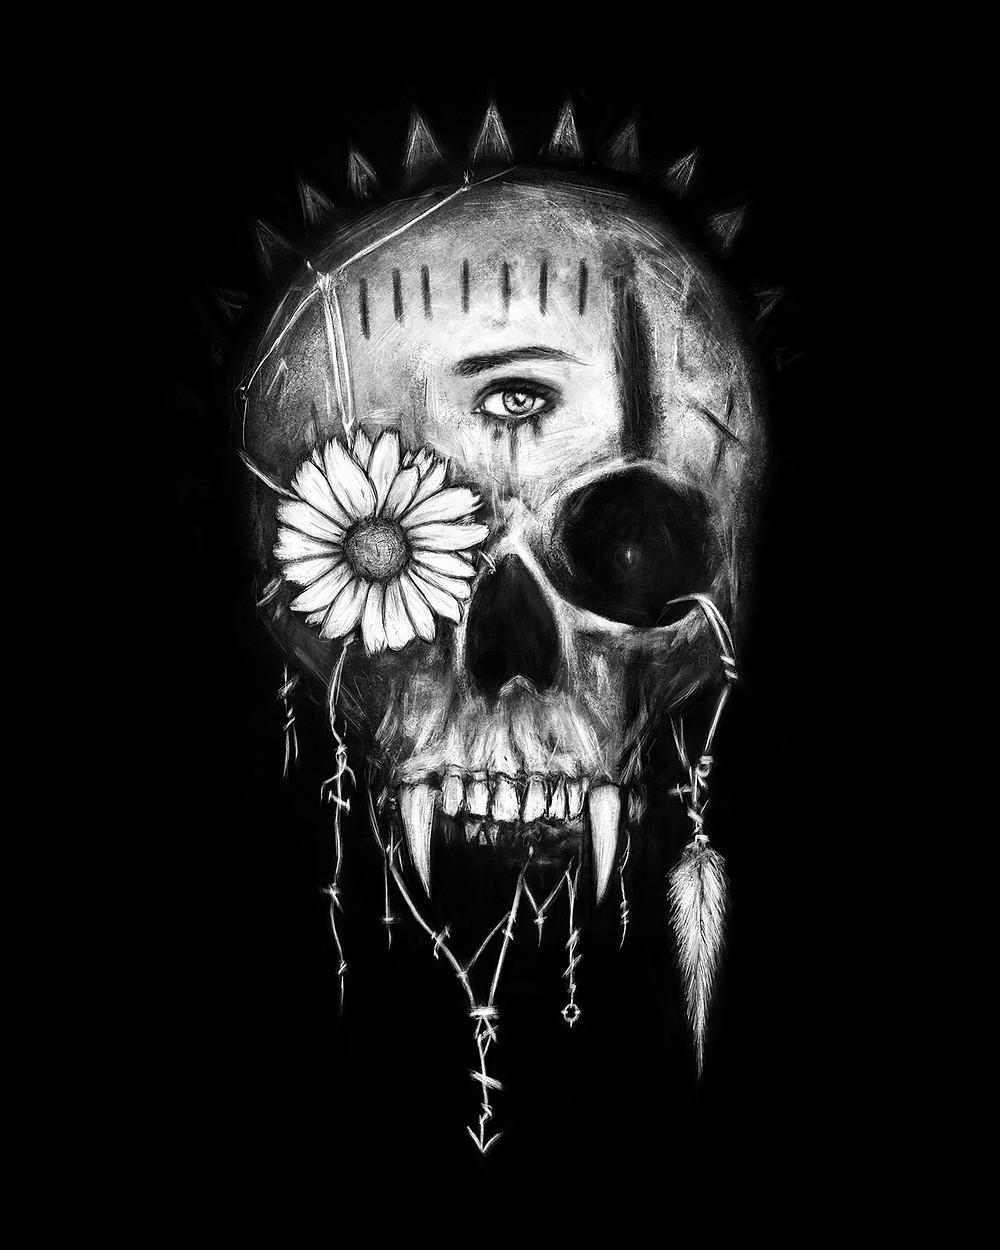 Gothic black and white vampire skull